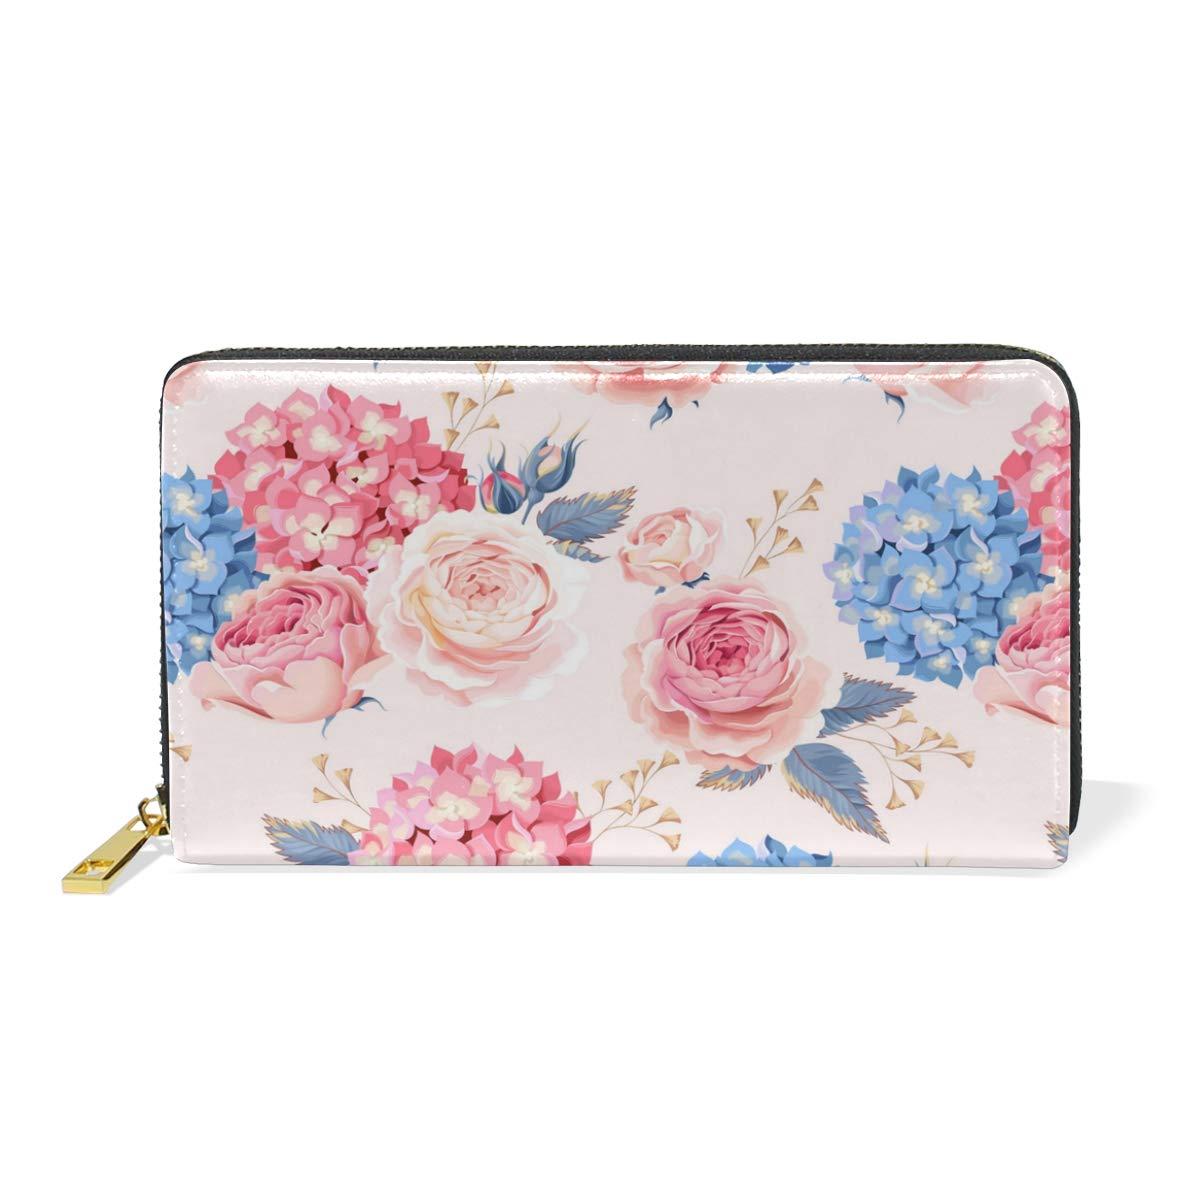 Elegant Zipper Rose Flower Women Wallet Long Wallet Card Holder Purse